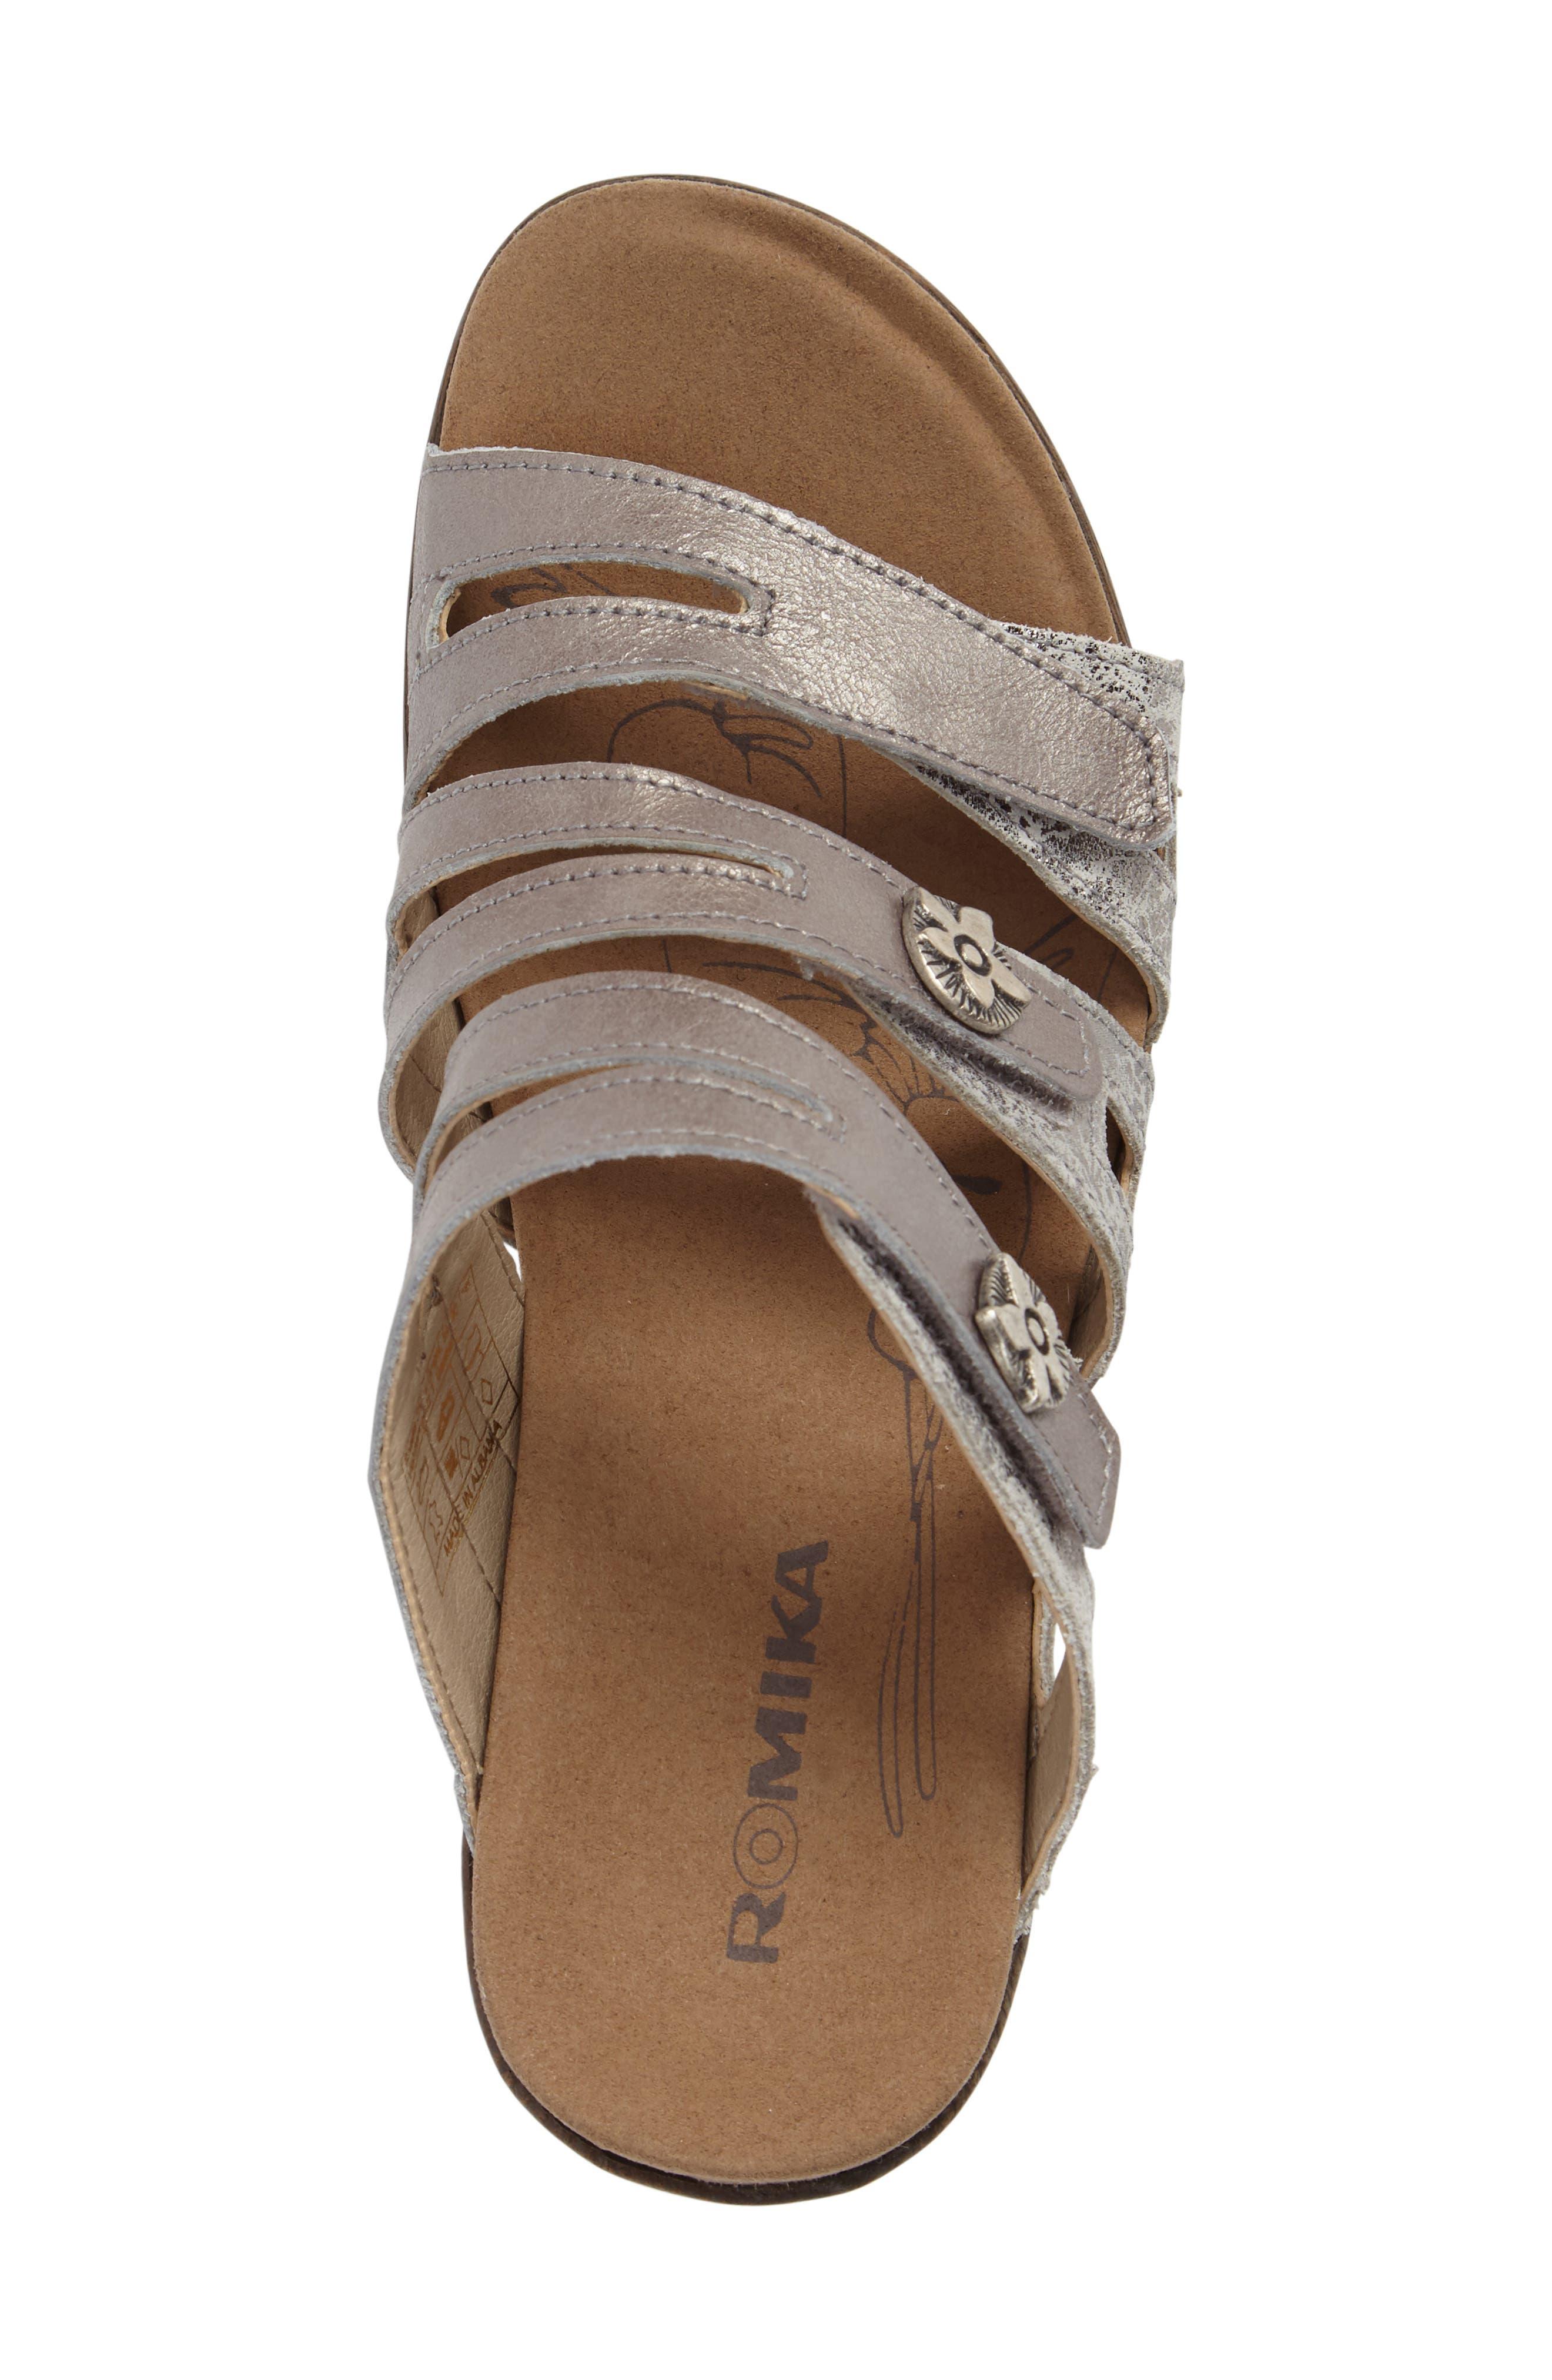 Nevis 04 Sandal,                             Alternate thumbnail 5, color,                             Platin Leather